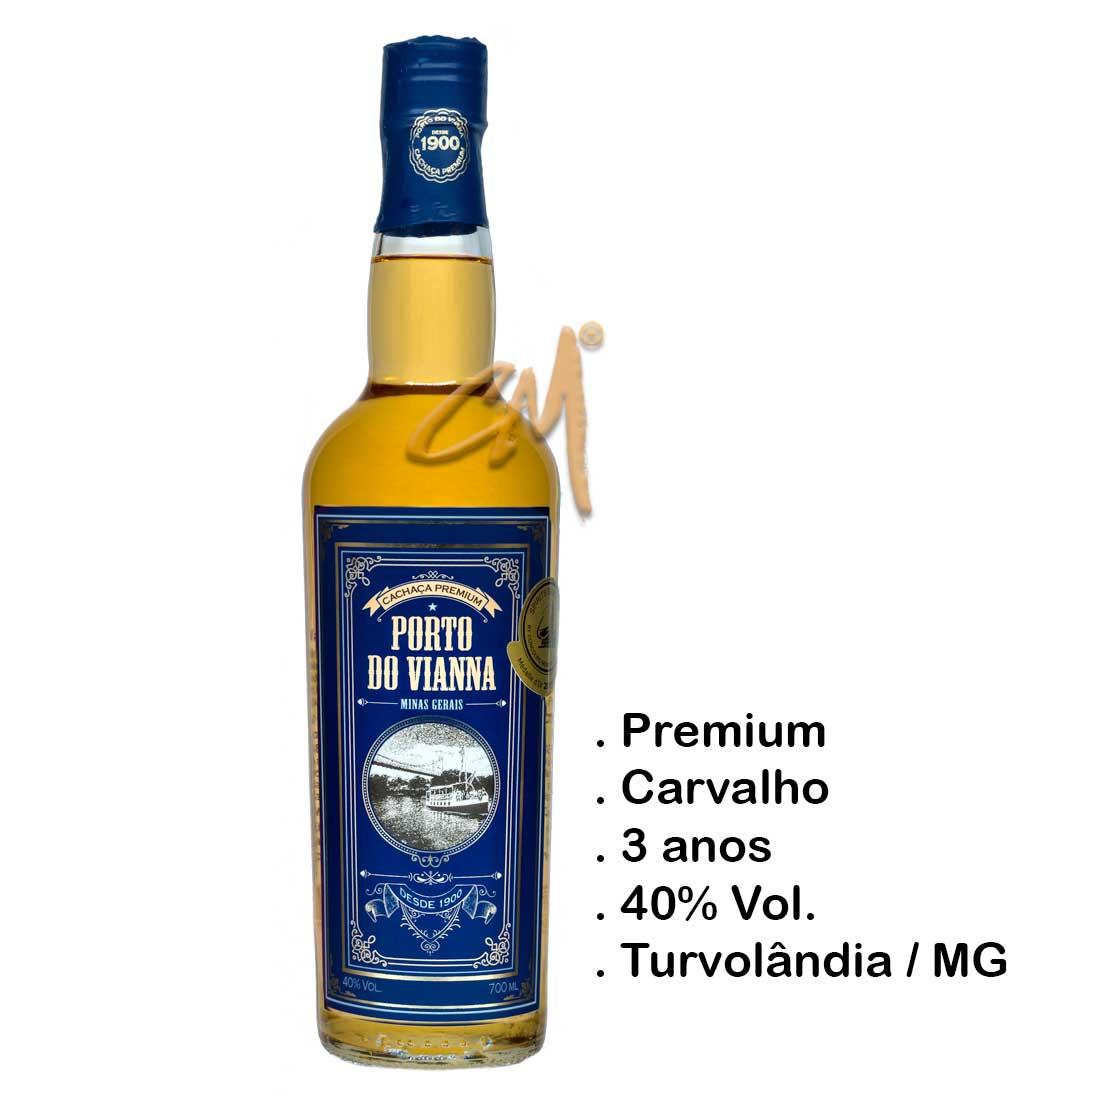 Cachaça Porto do Vianna Premium 700 ml (Turvolândia - MG)